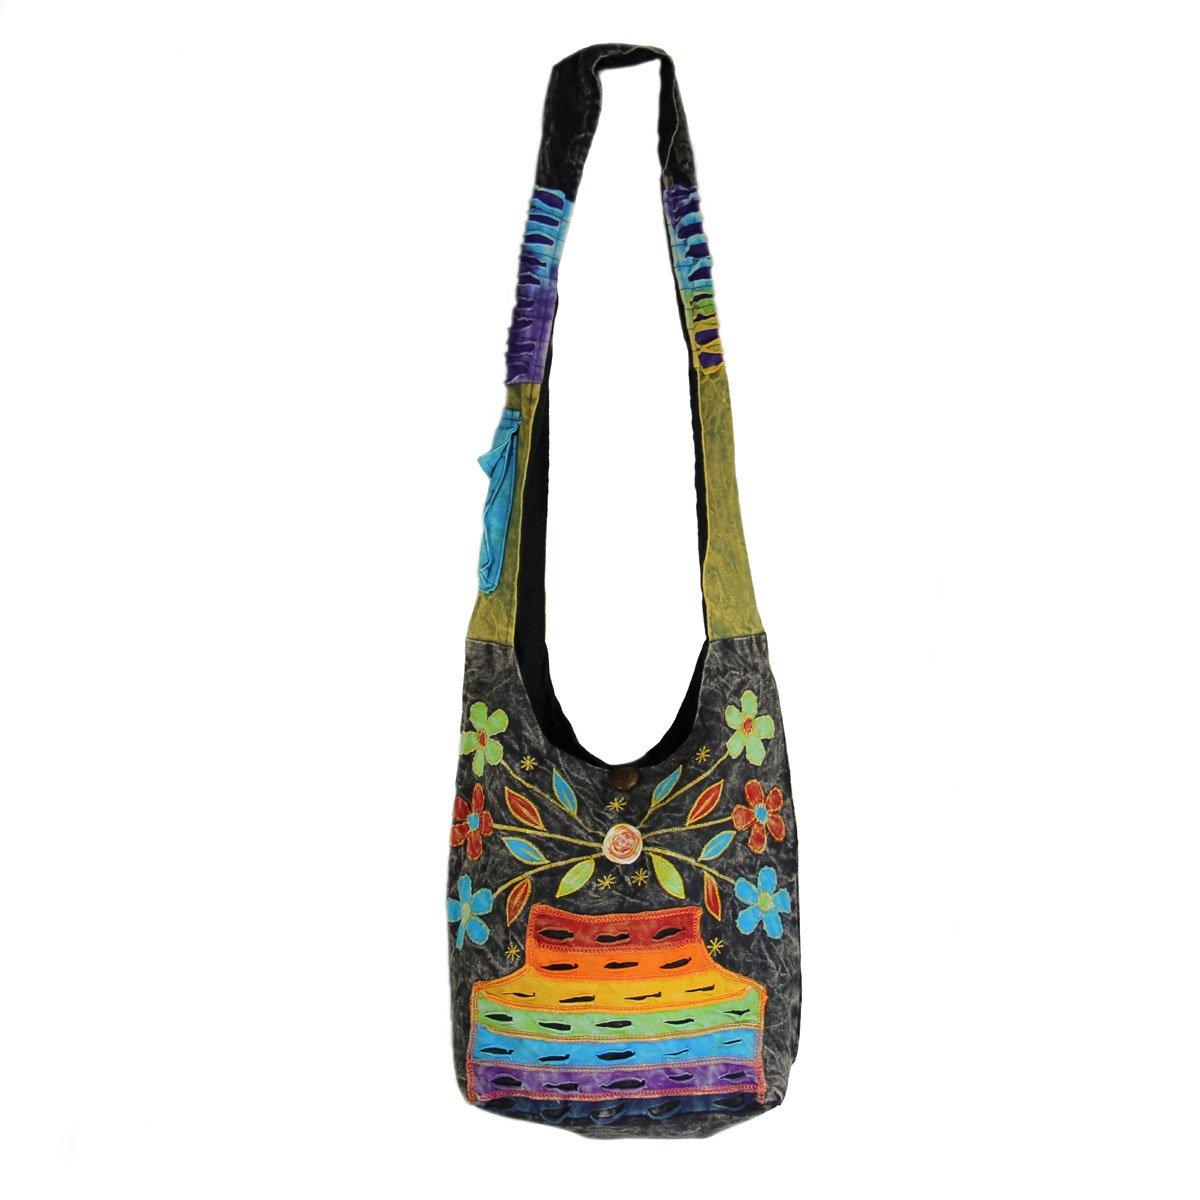 bdda706d22ec Amazon.com  Rising International Stone Washed Flower Patch Hobo Bag Multi  Color  Shoes